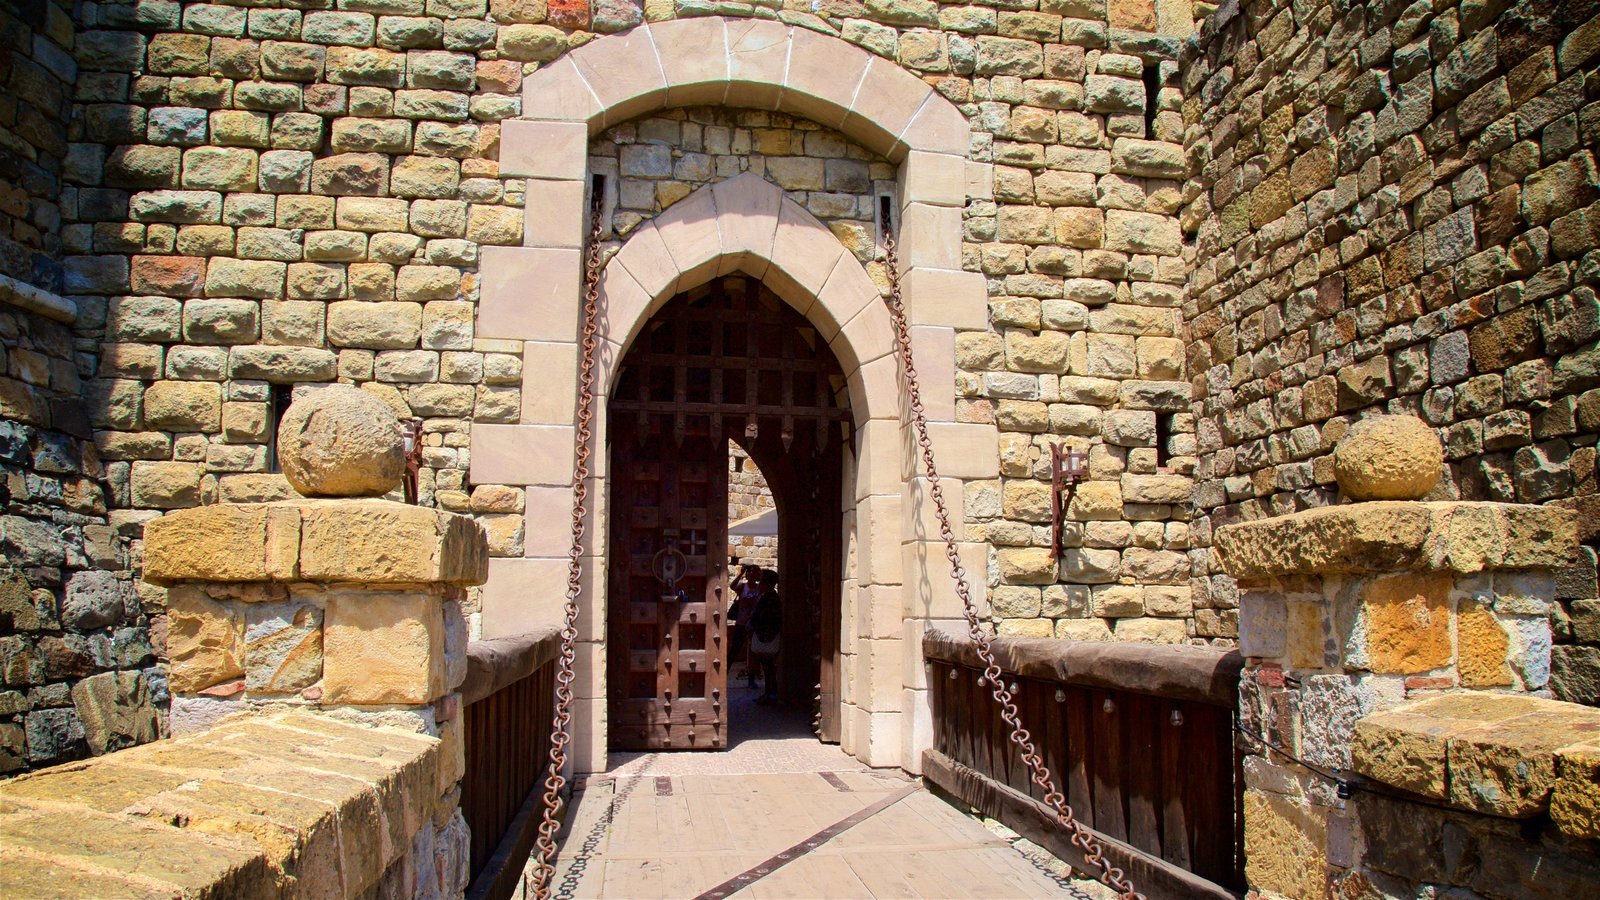 Castello di Amorosa which includes a castle and heritage elements